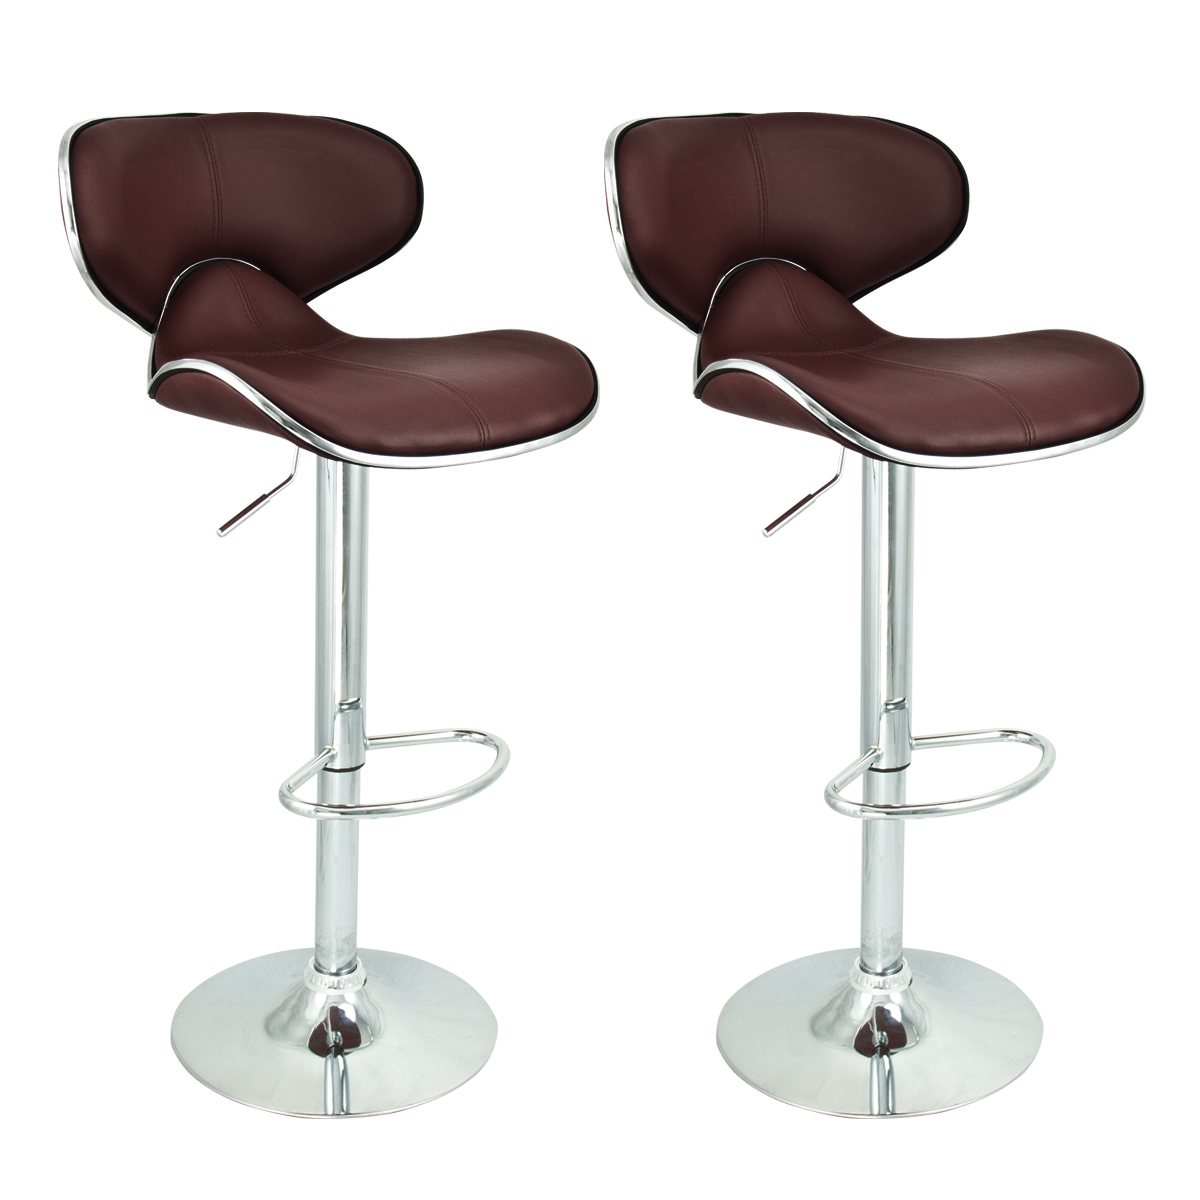 2 Modern Barstool Swivel Leather Adjustable Hydraulic Bar Stool Kitchen Chairs Ebay